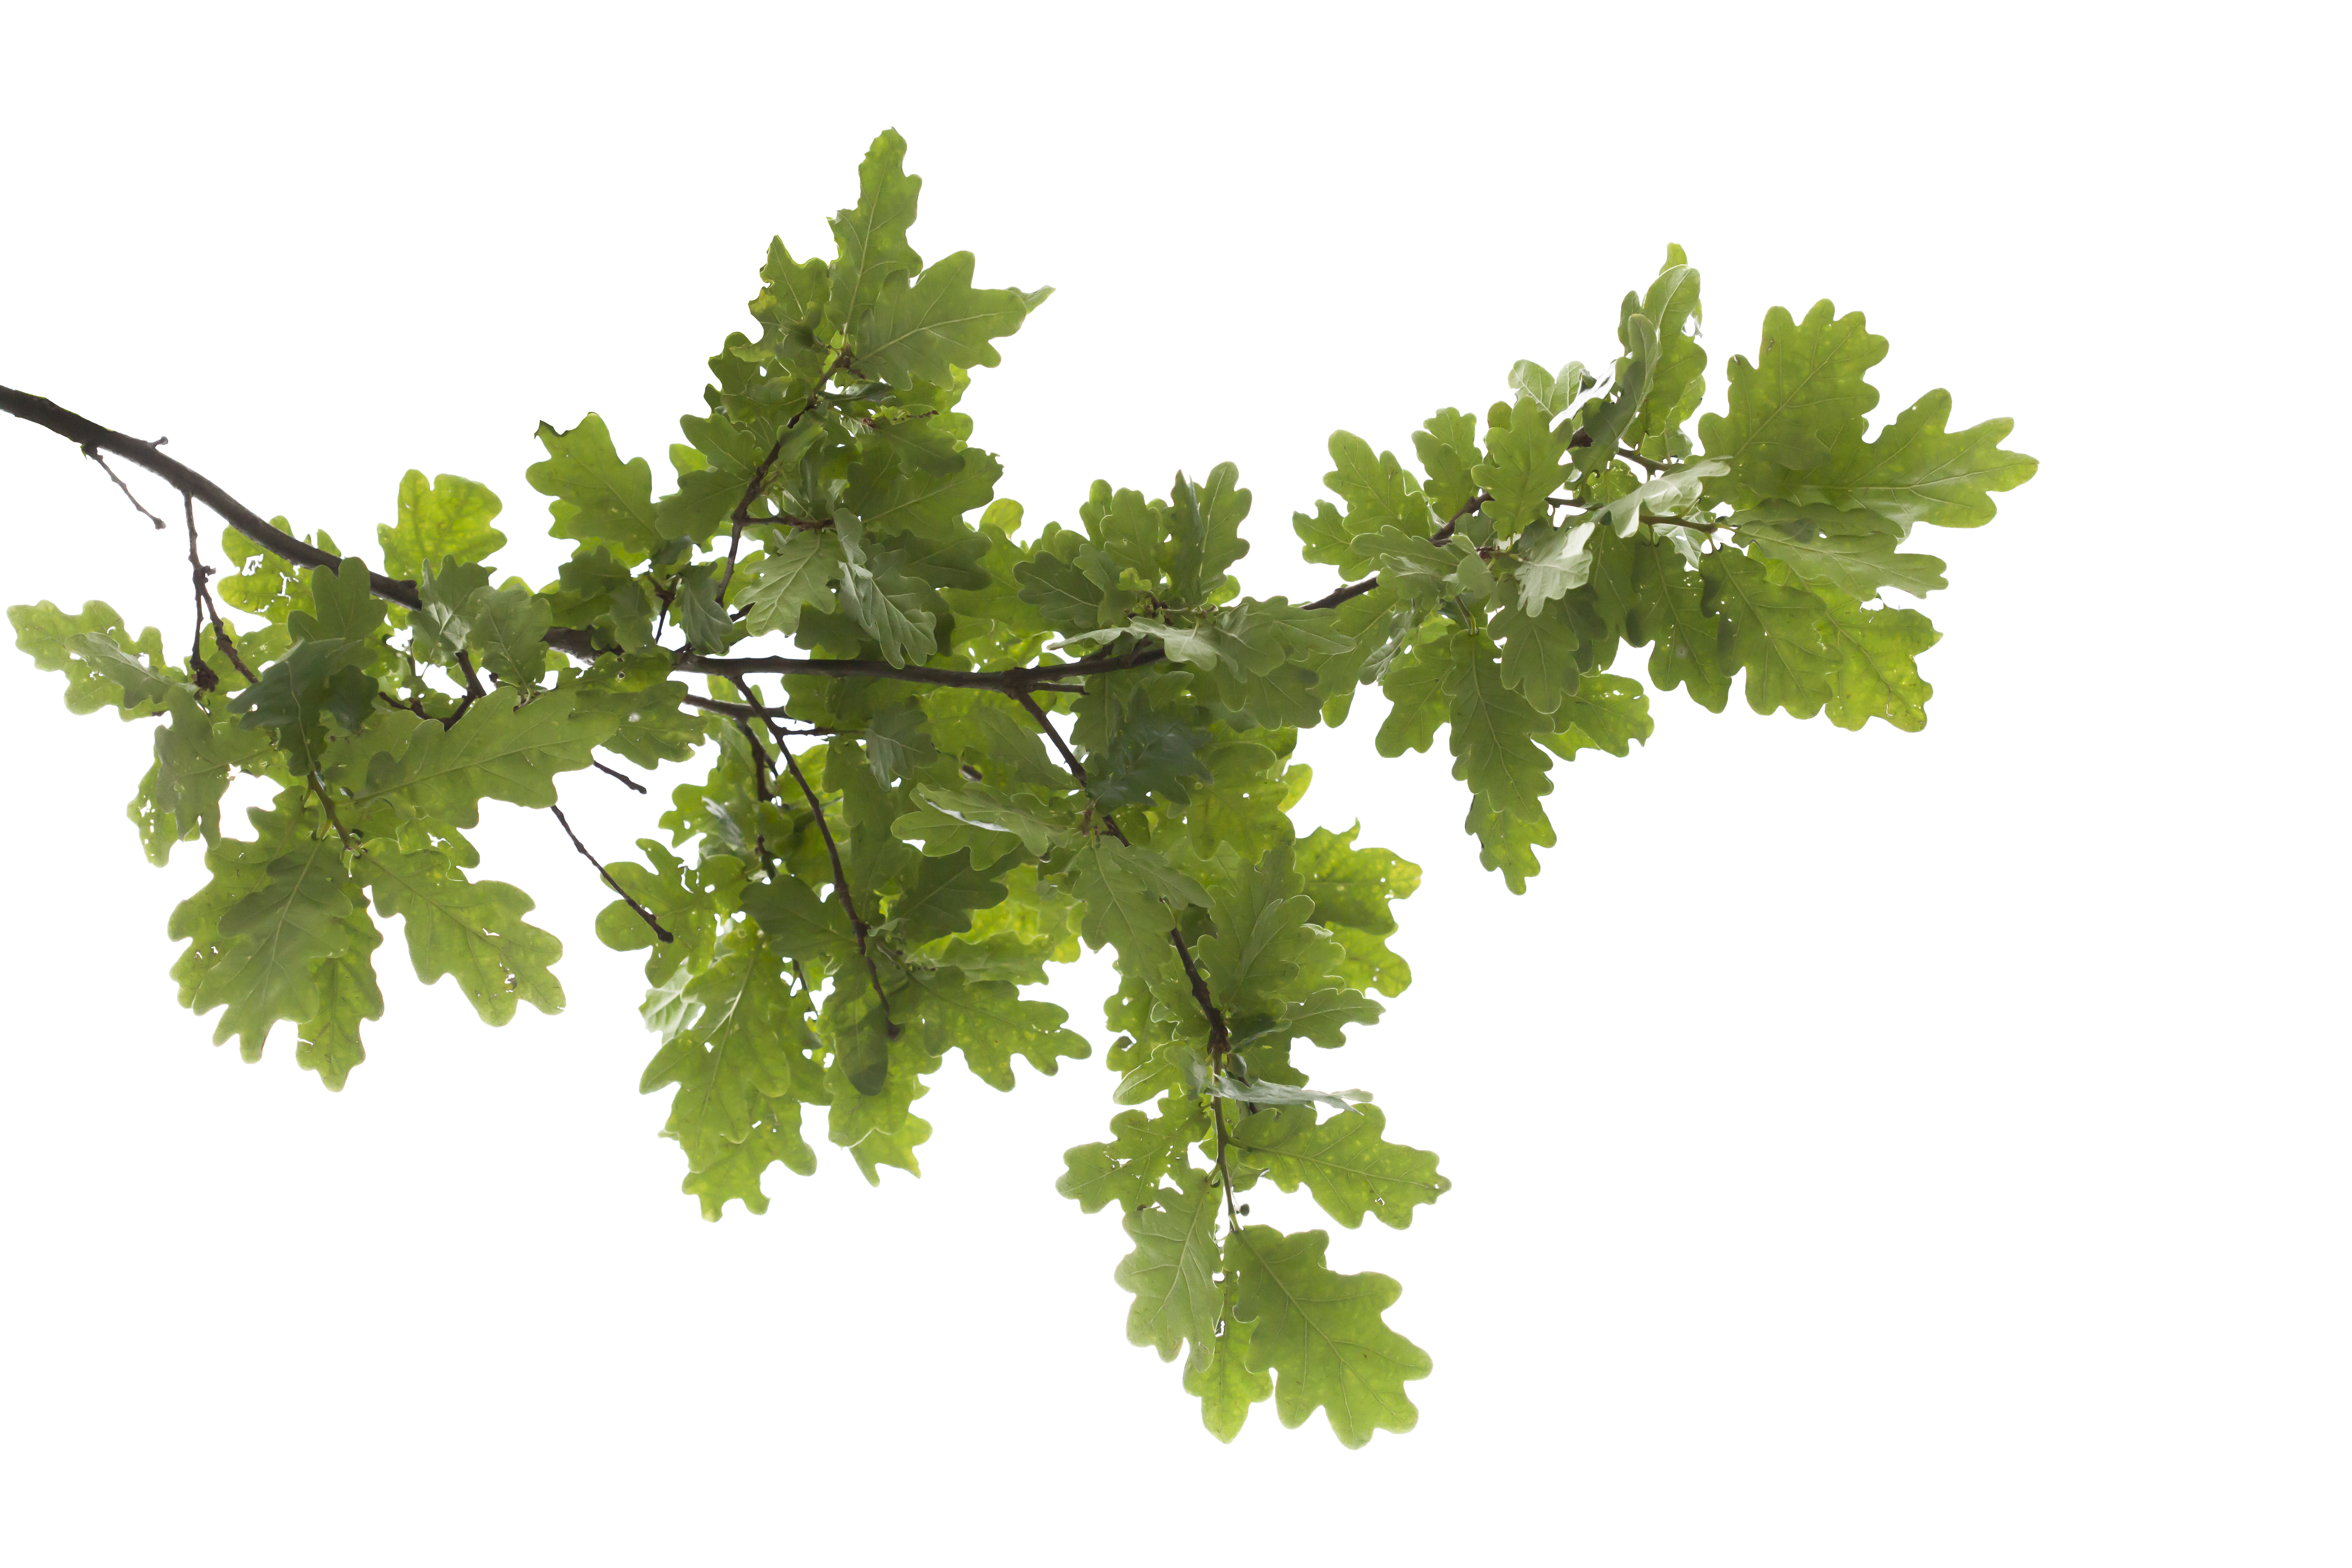 Oak tree branches clipart jpg royalty free oak-tree-icon-9.png (5616×3744) | PNG white bg | Pinterest jpg royalty free